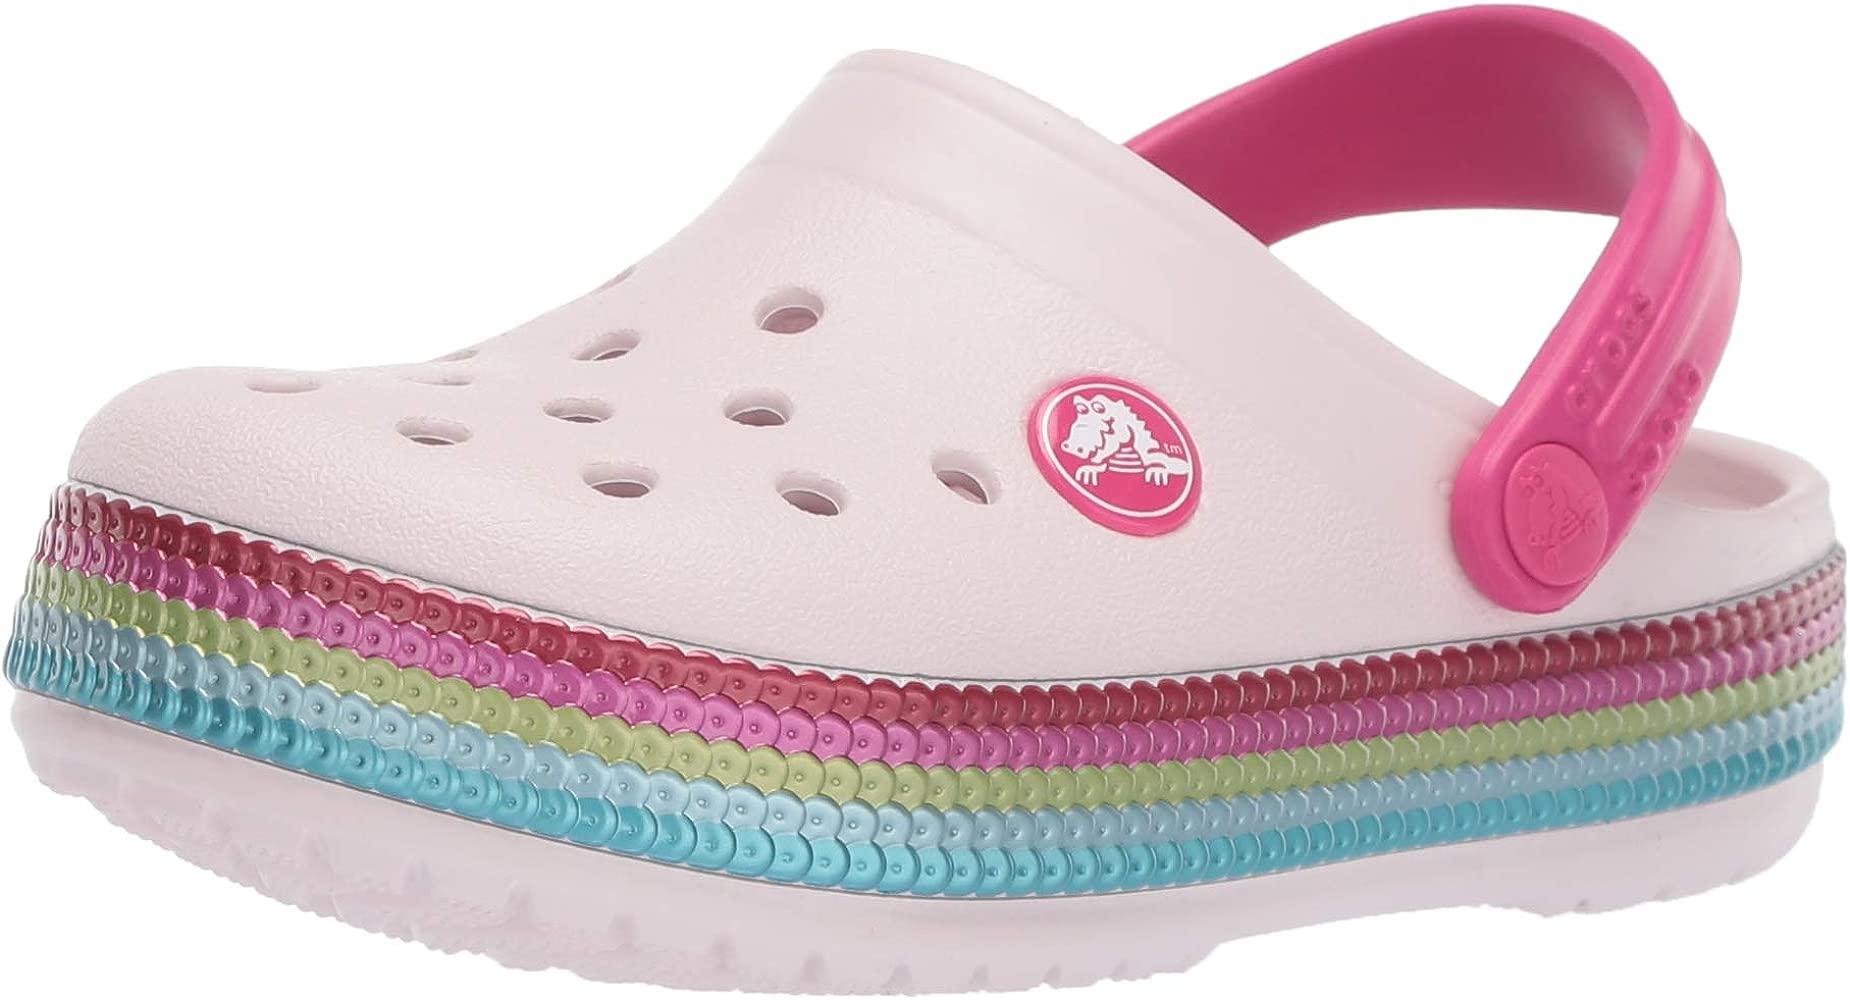 Barely Pink Crocs Crocband Sequin Band Kids Clog